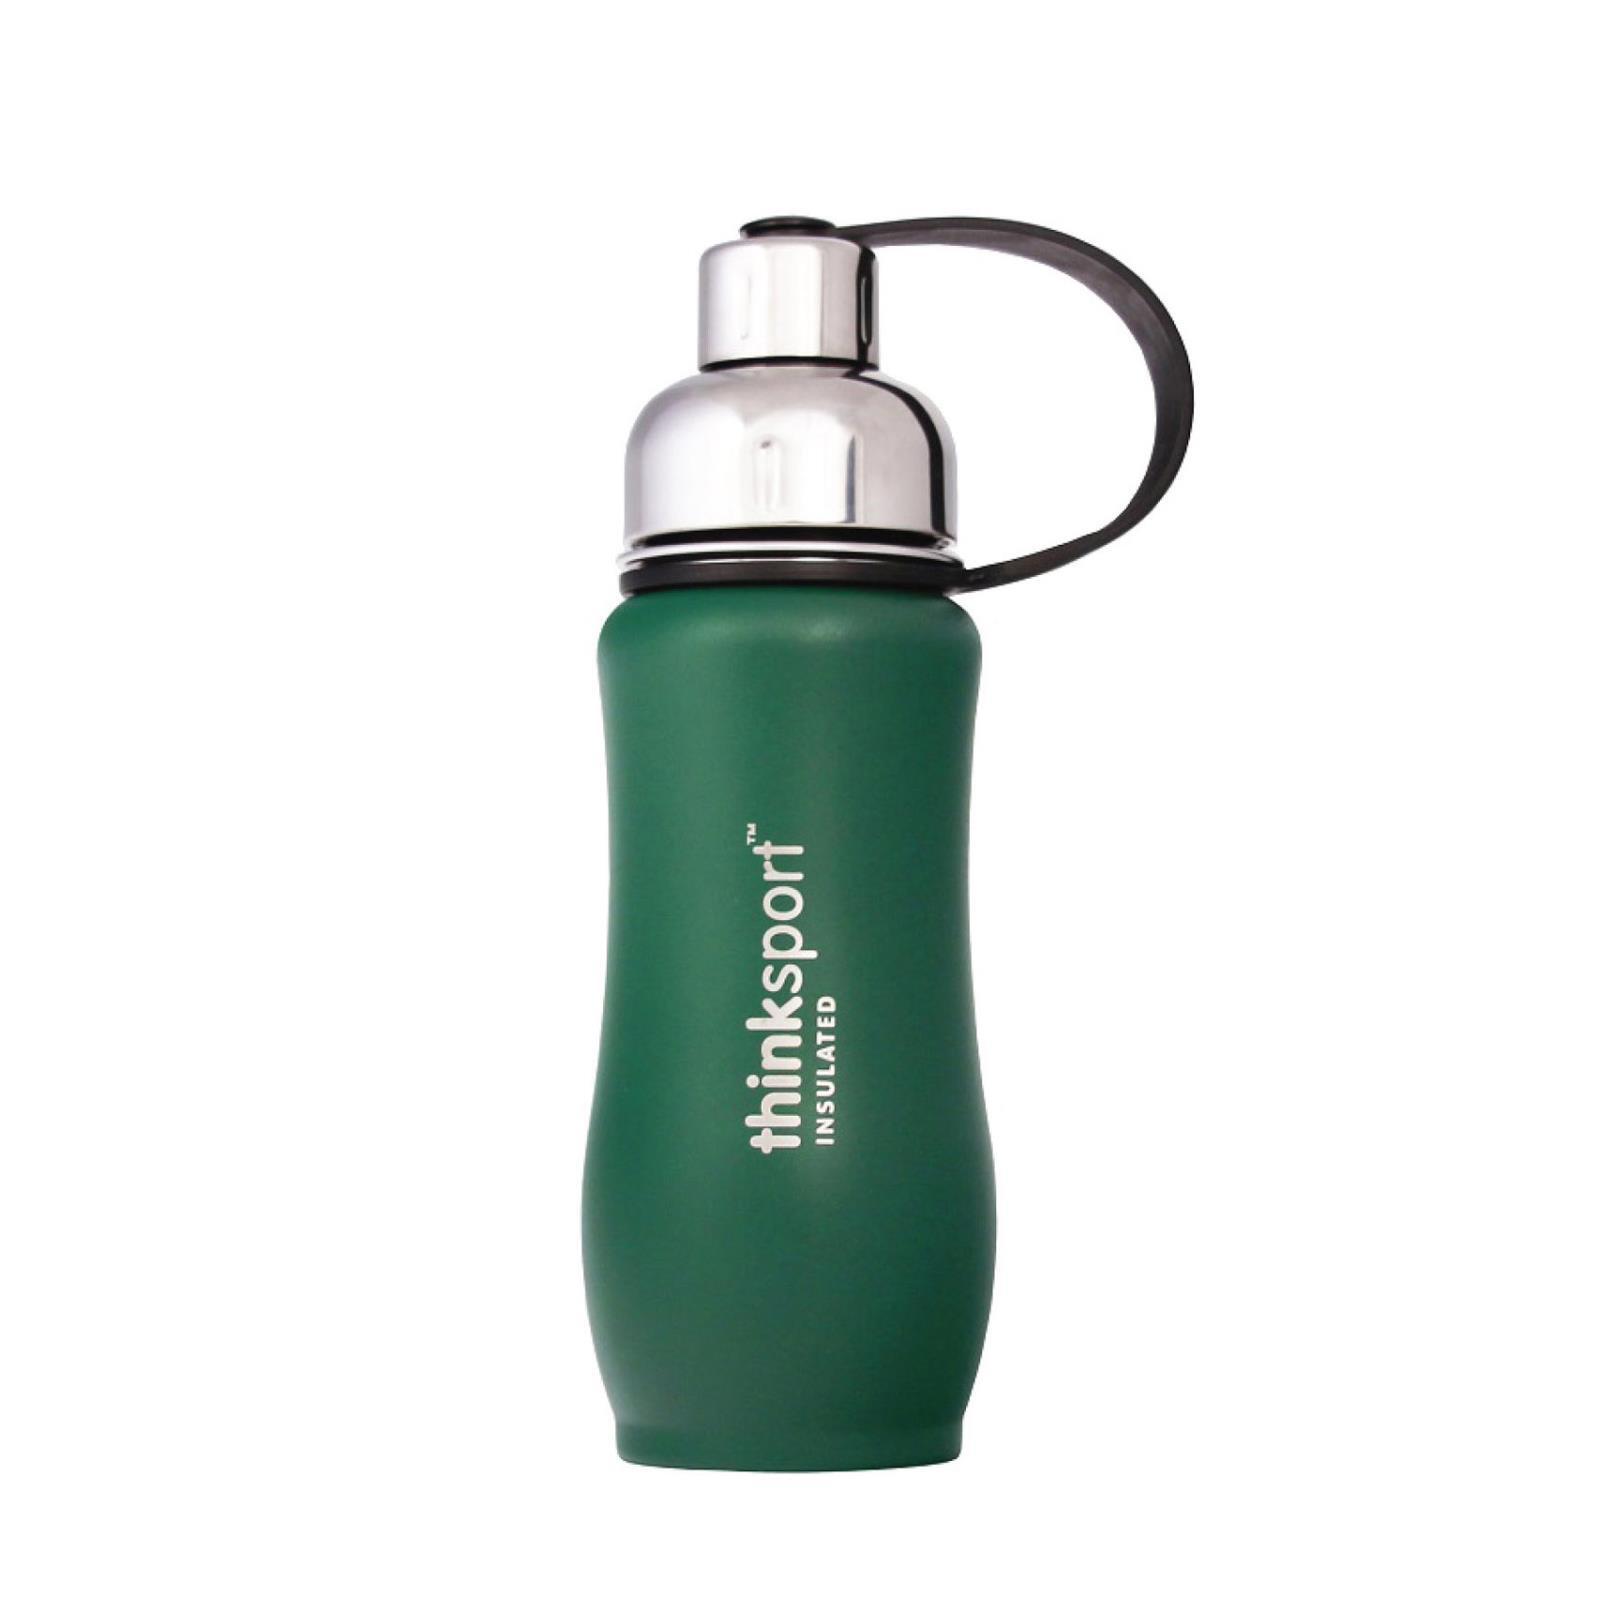 Thinksport  12oz(350ml) insulated Sports Bottle - Green